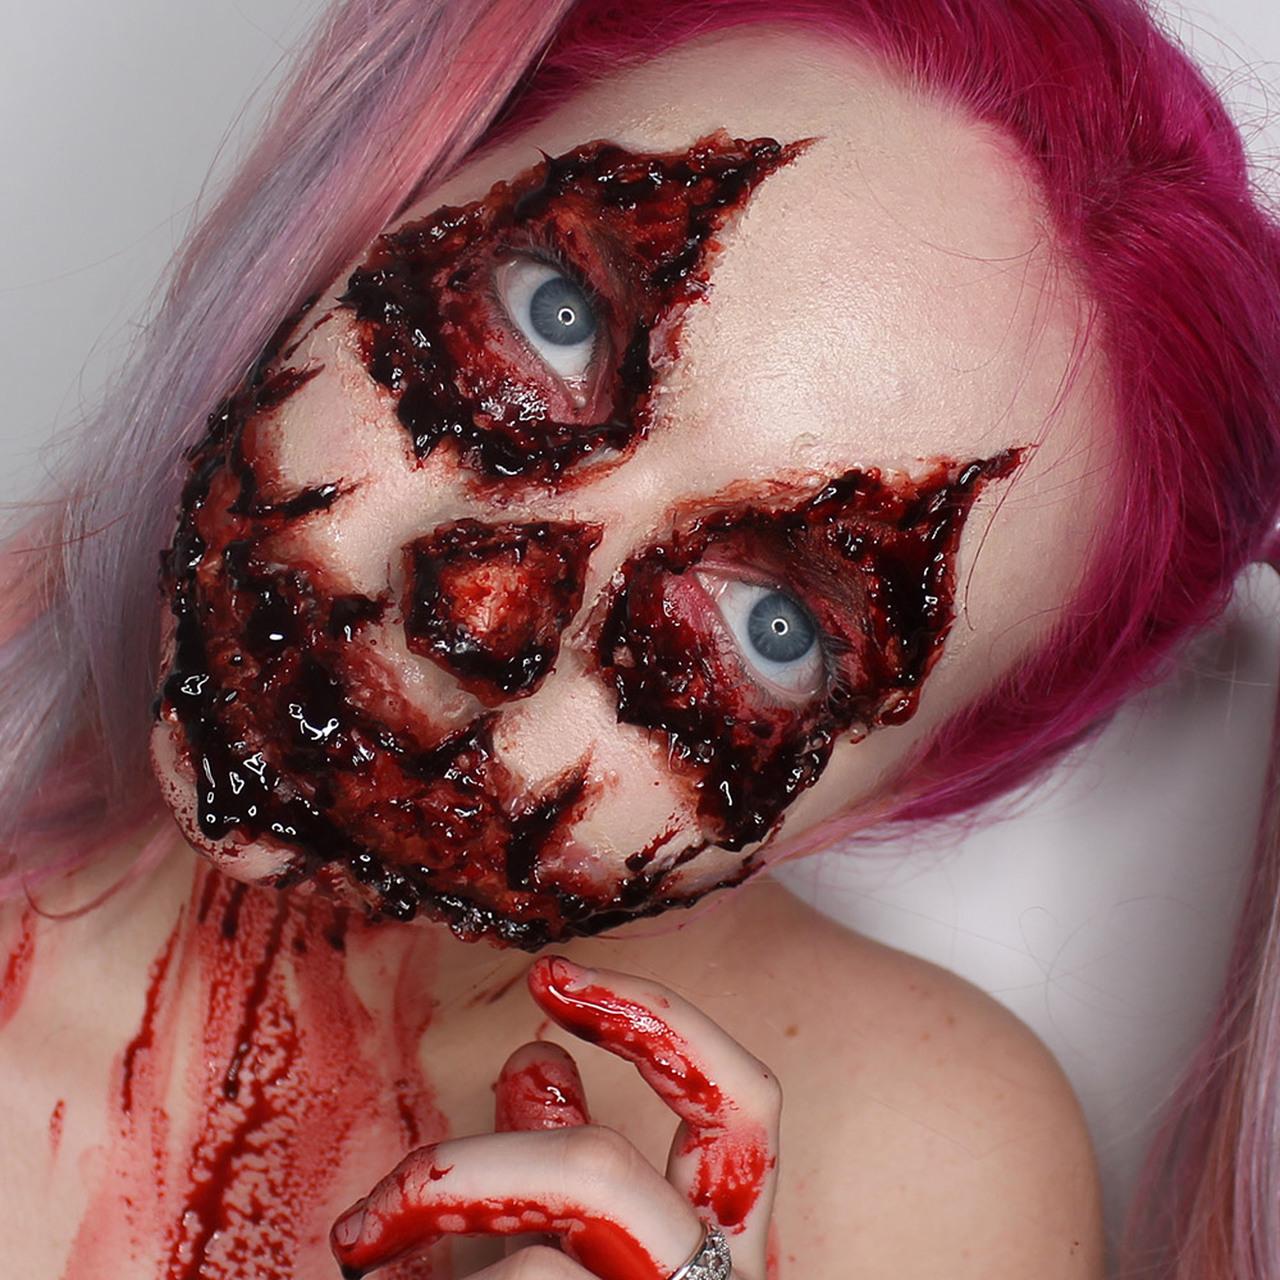 Stage_Blood_coagulated_model.jpg